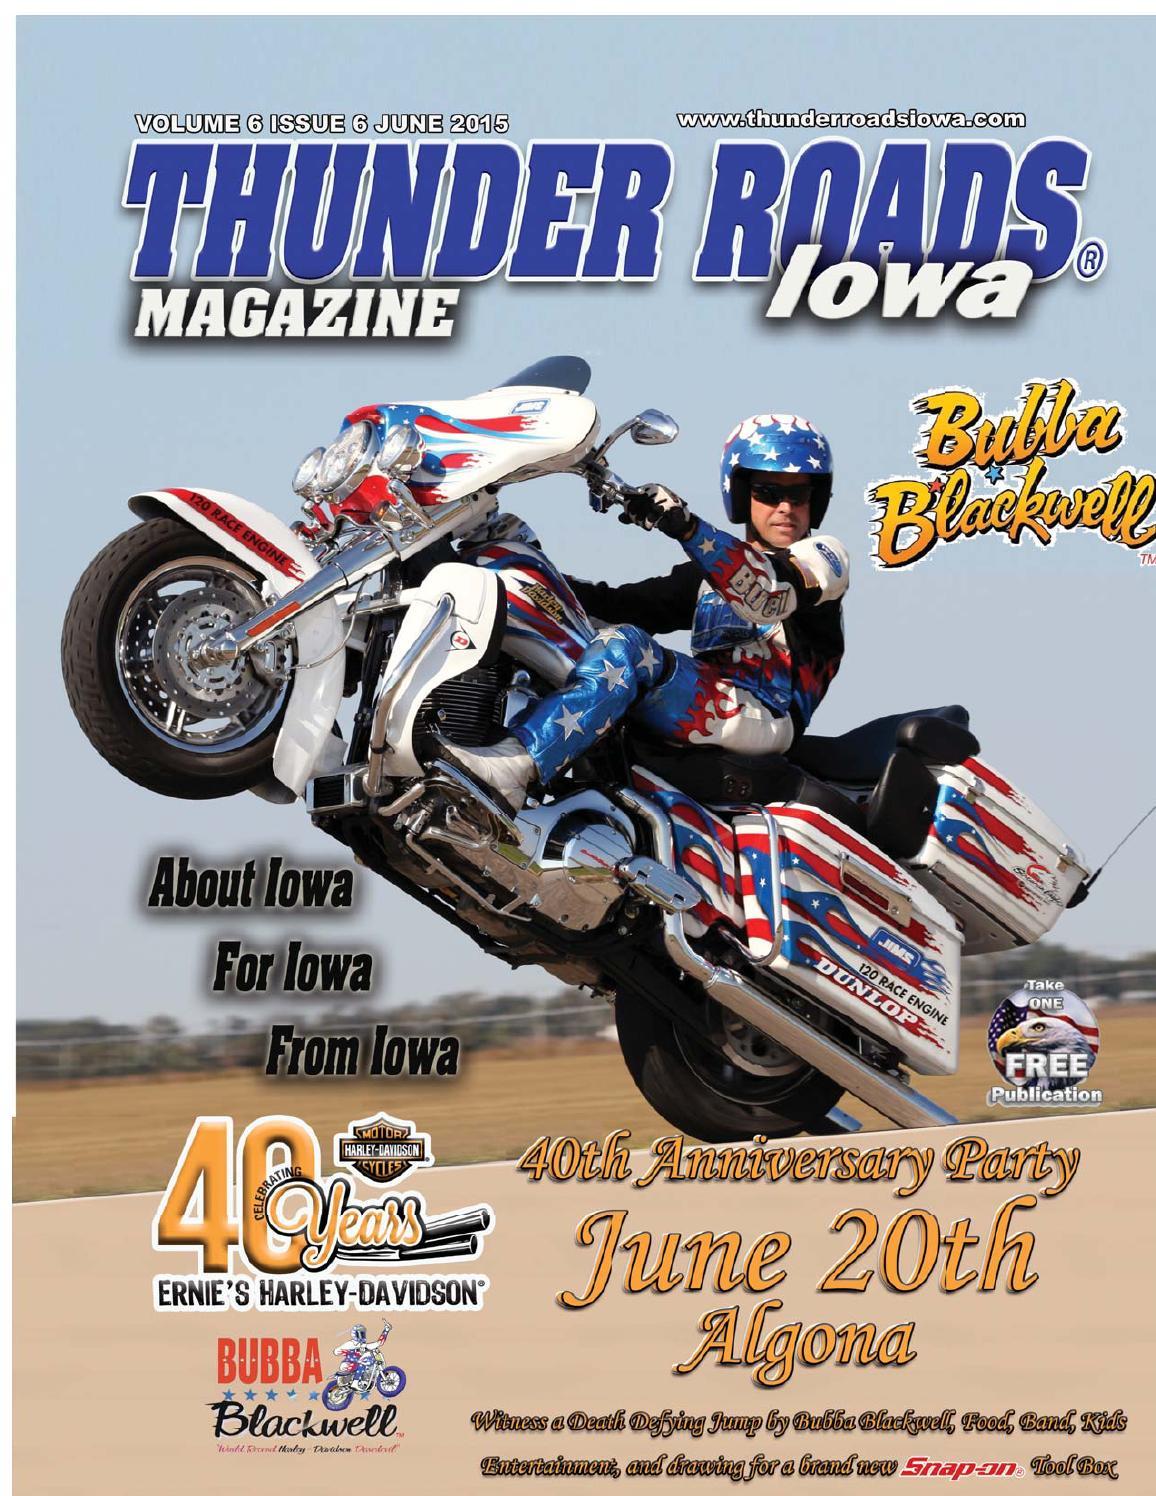 Thunder Roads Magazine Of Iowa June 2015 By Harley Motorcycle Engine Drawing Vquad And Method Issuu